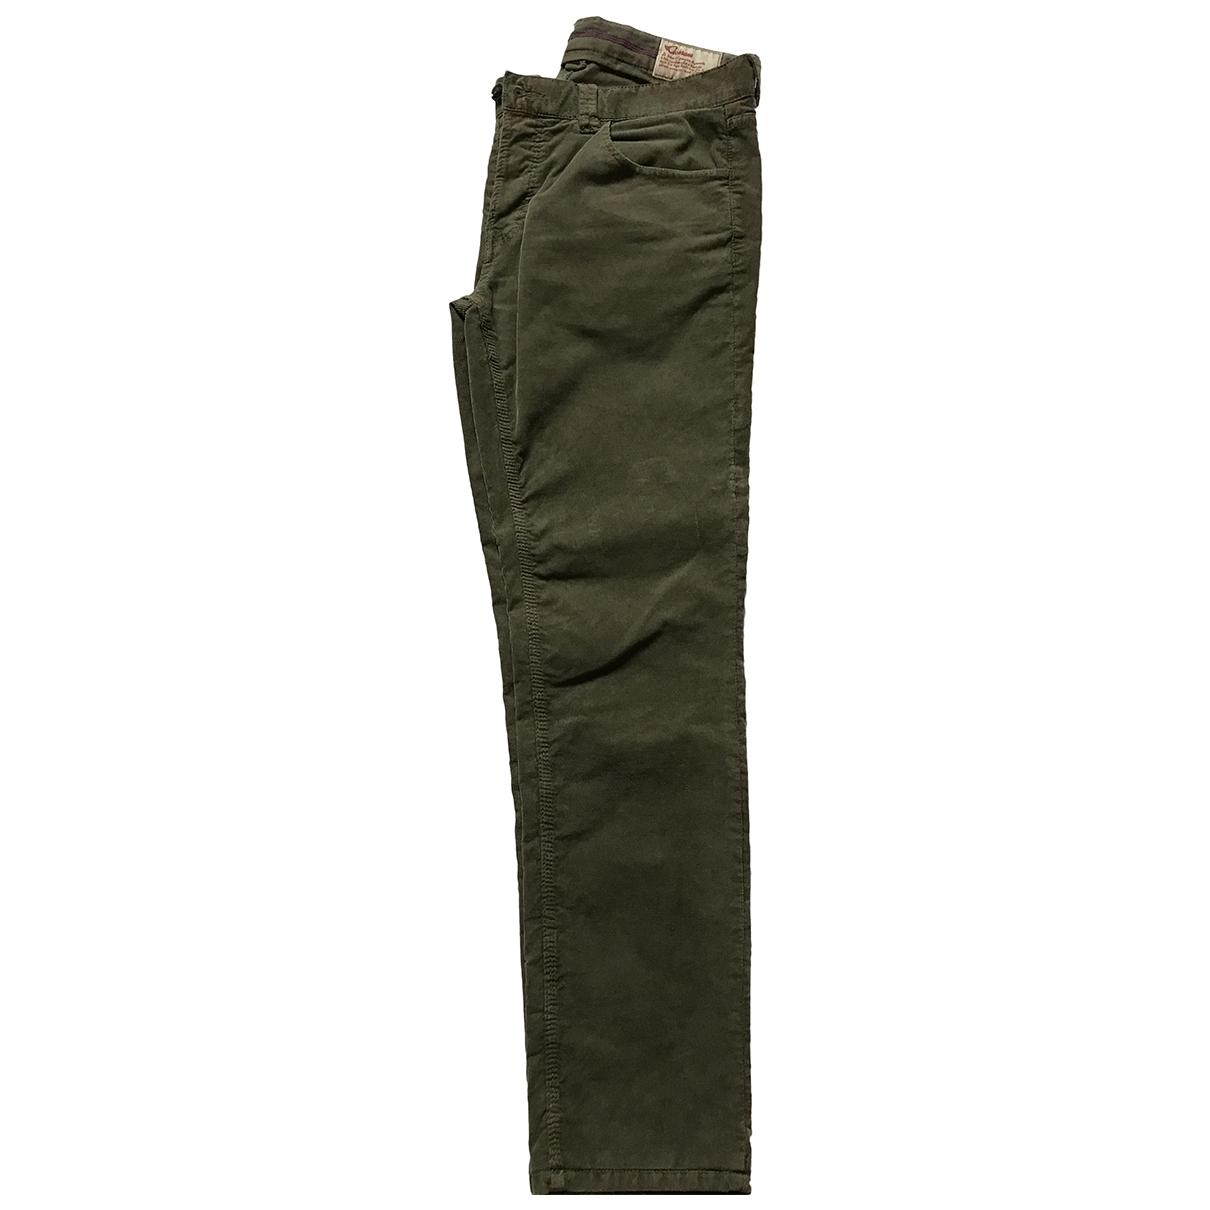 Pantalon de Terciopelo Non Signe / Unsigned